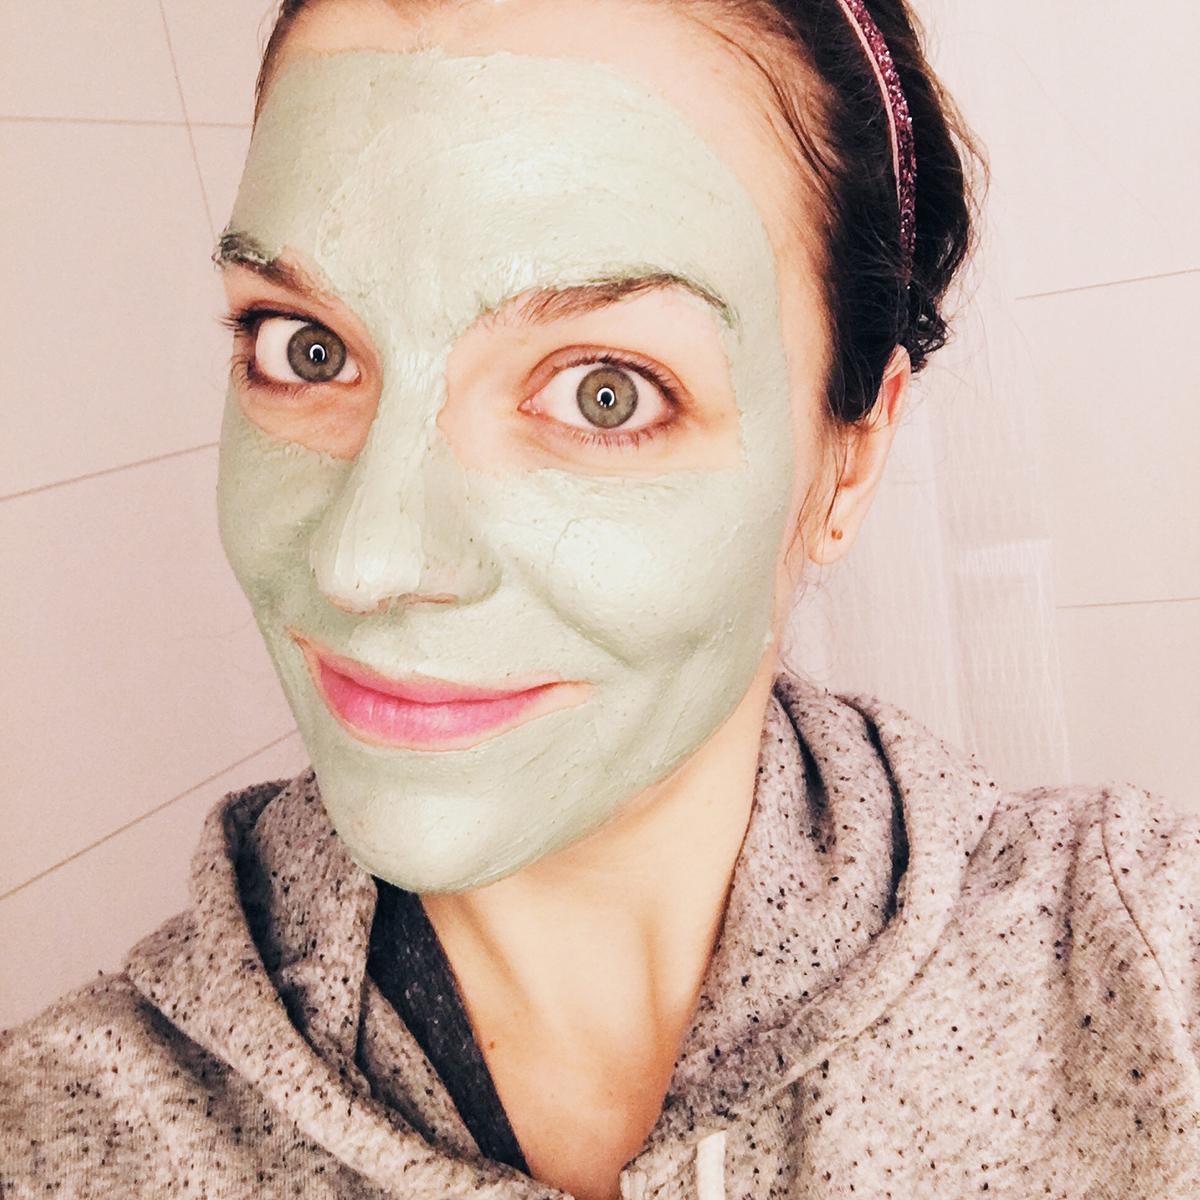 Foxycheeks Beautyblog